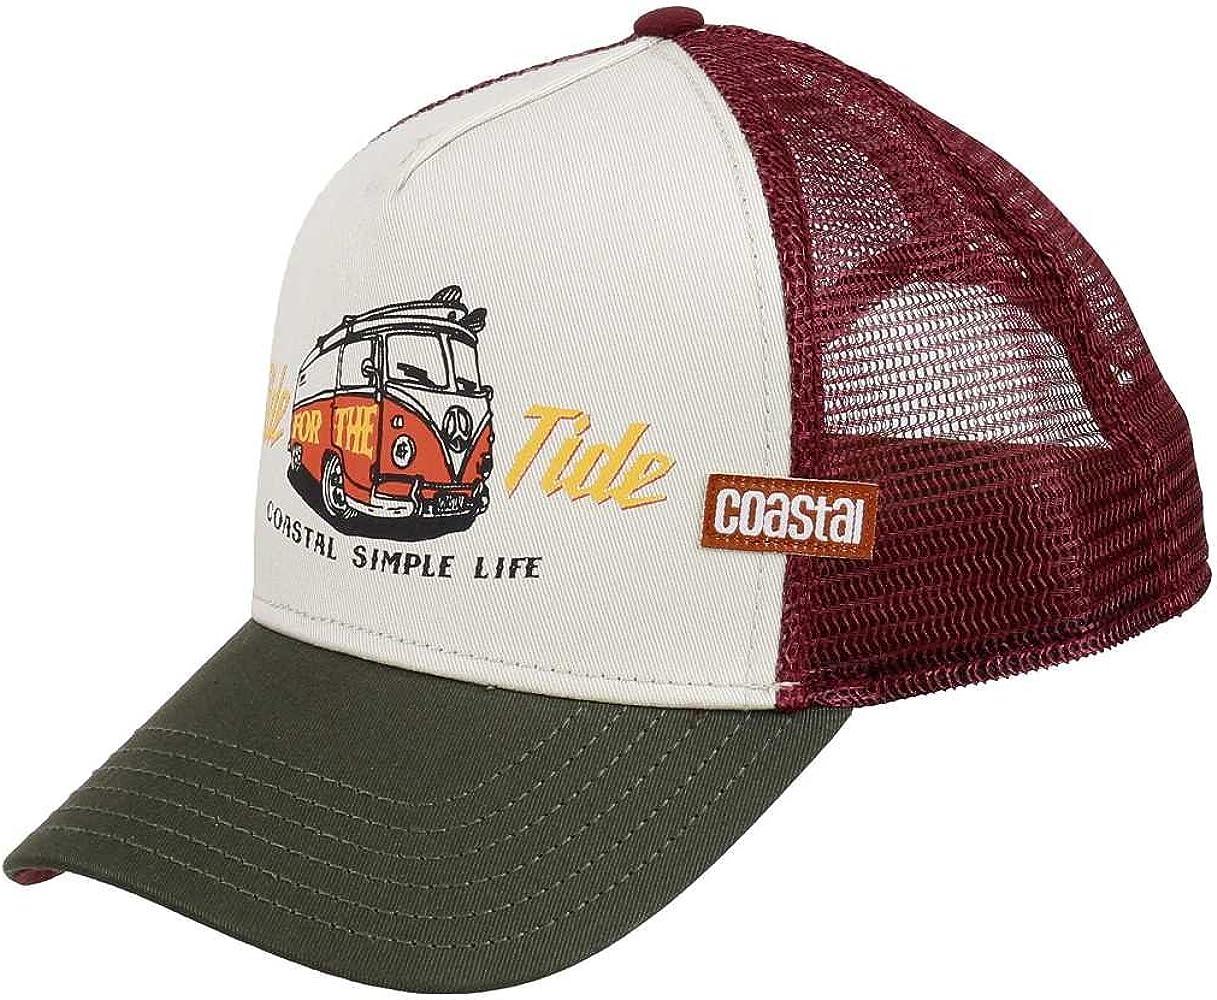 Coastal - Ride Tide (Beige) - Trucker Cap Gorra del Camionero de ...